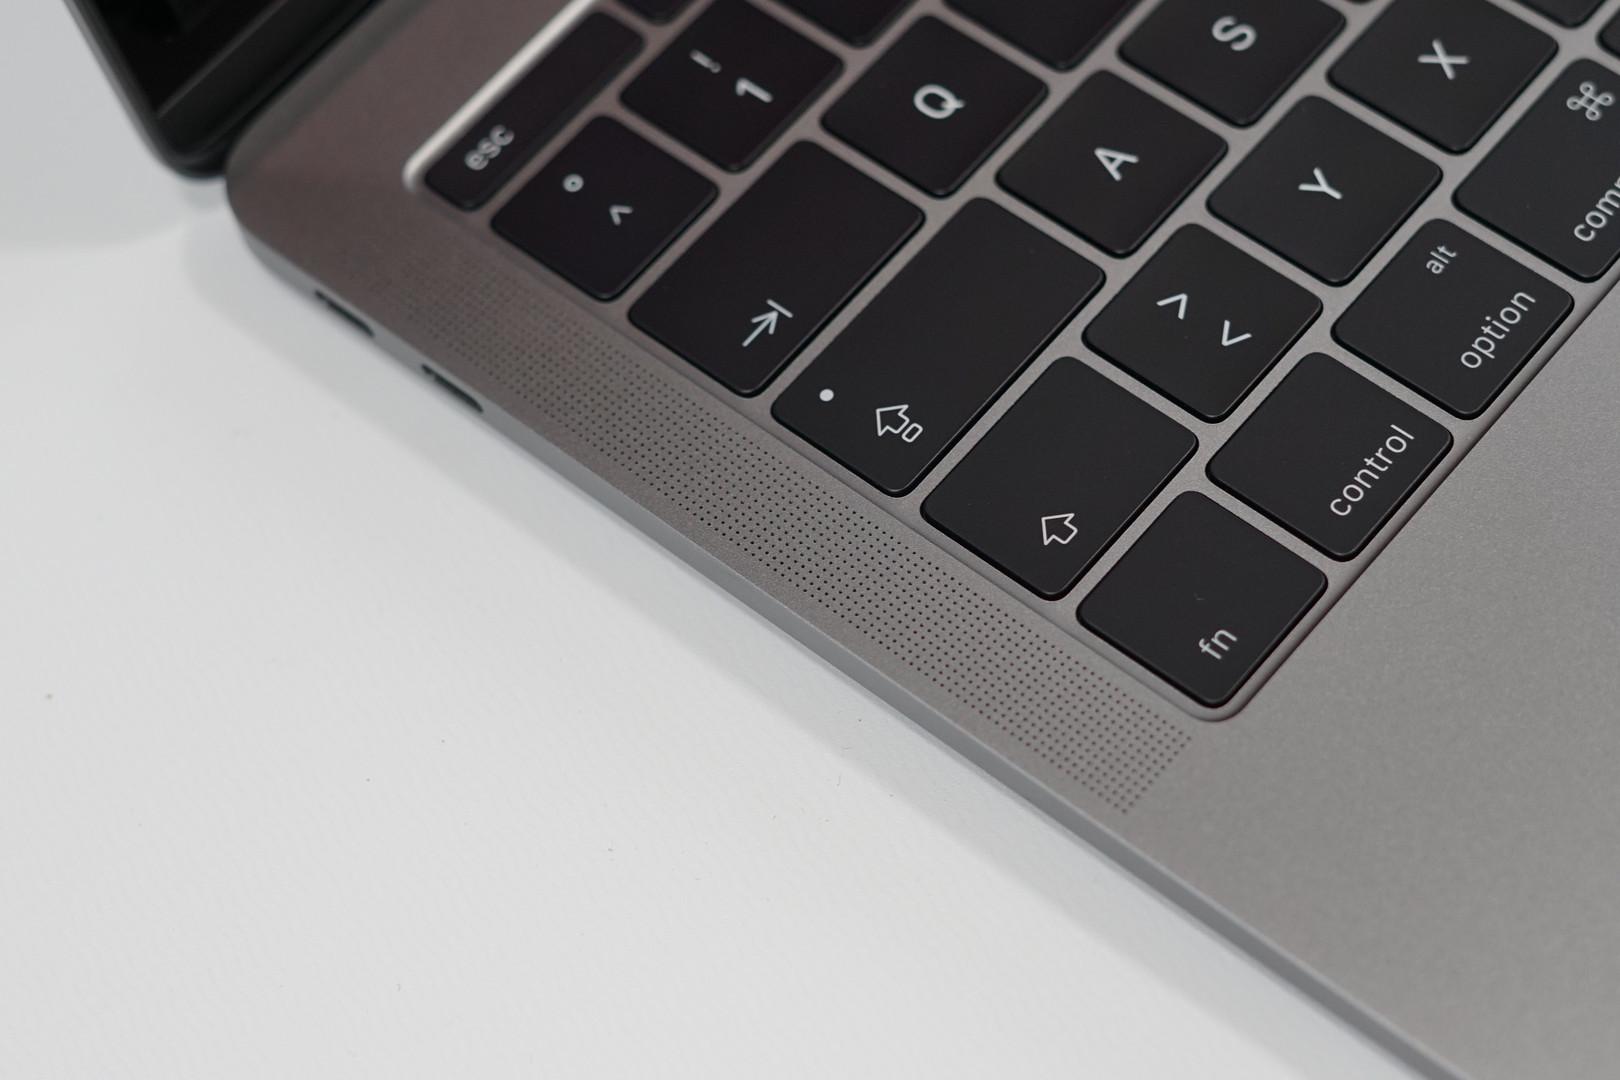 test apple macbook pro 13 mid 2017 i5 ohne touch bar. Black Bedroom Furniture Sets. Home Design Ideas